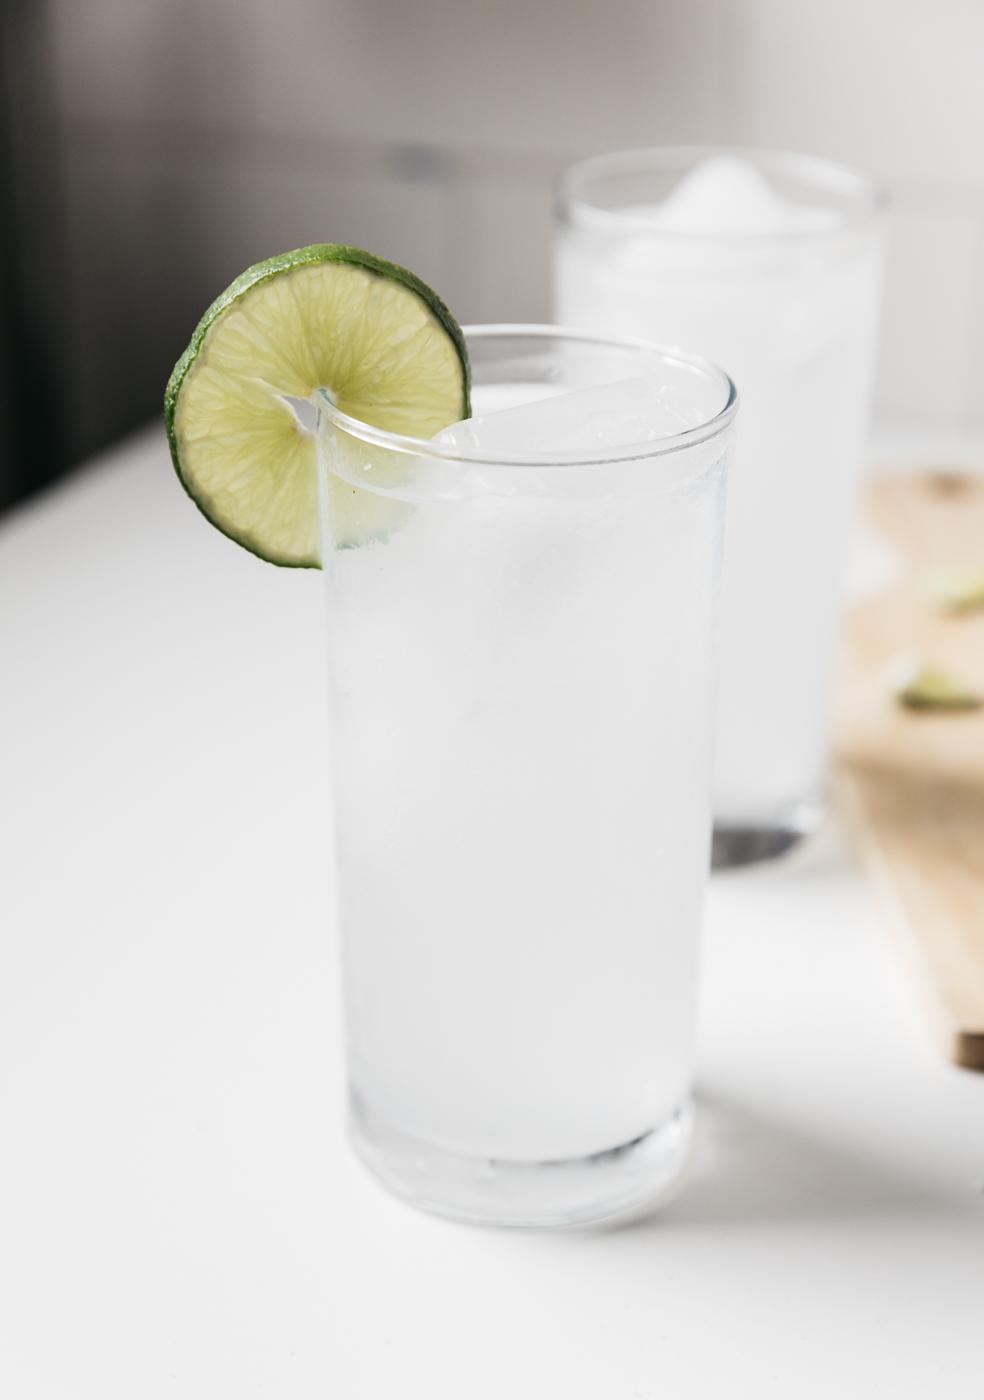 cayman jack, premixed margaritas, prepared cocktails, top drinks for summer, top lifestyle blog